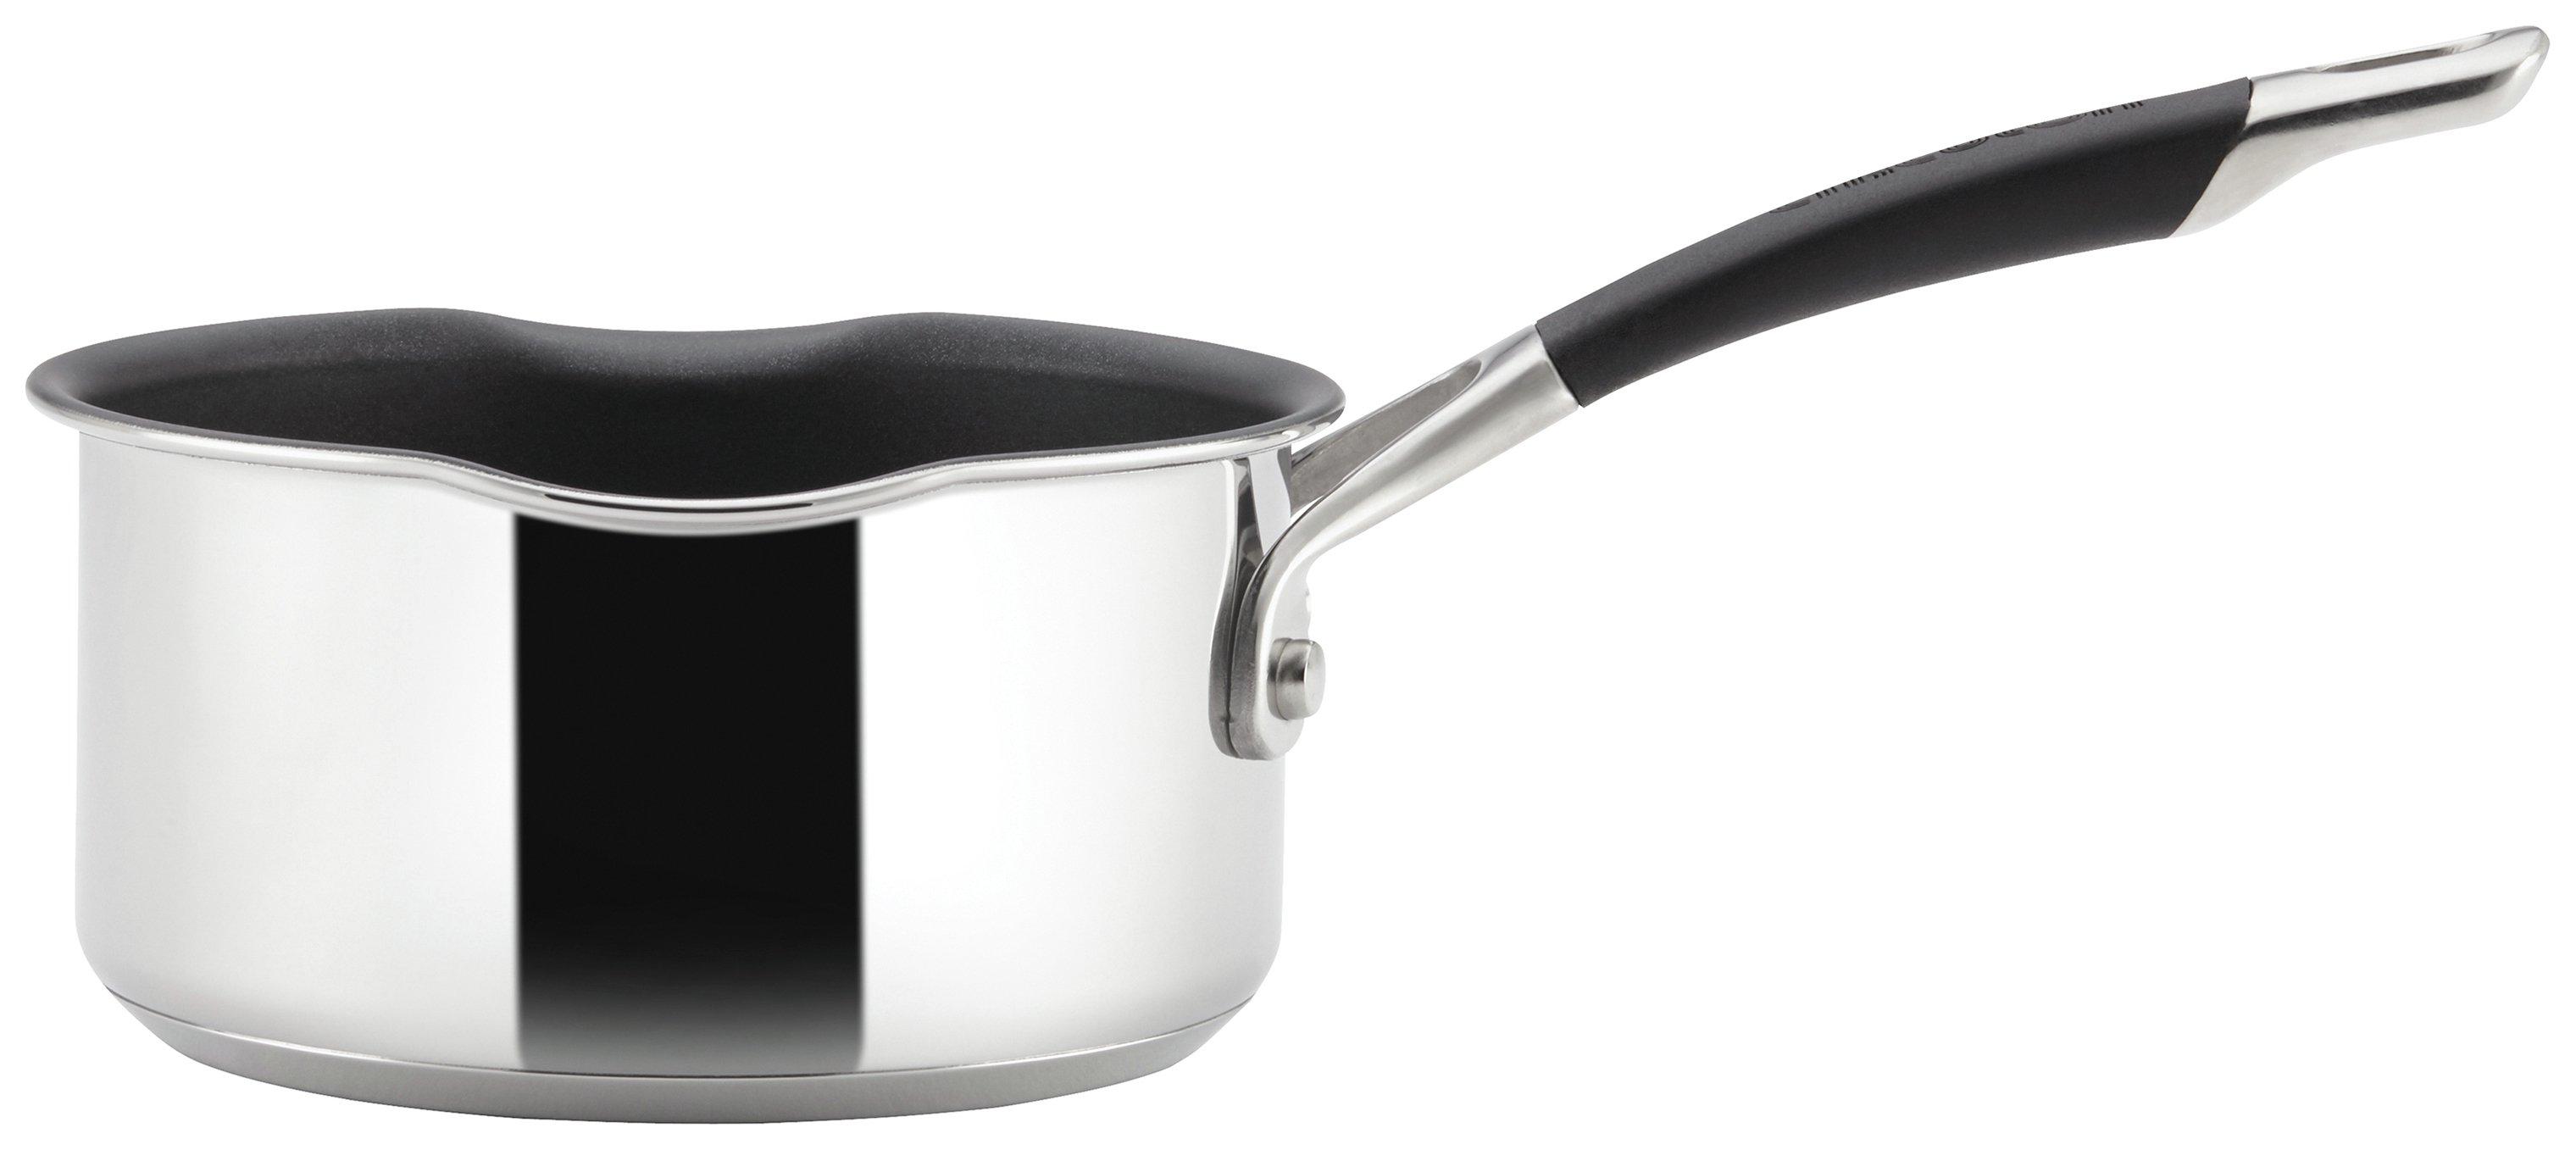 Image of Circulon Momentum 14cm Stainless Steel Milk Pan.